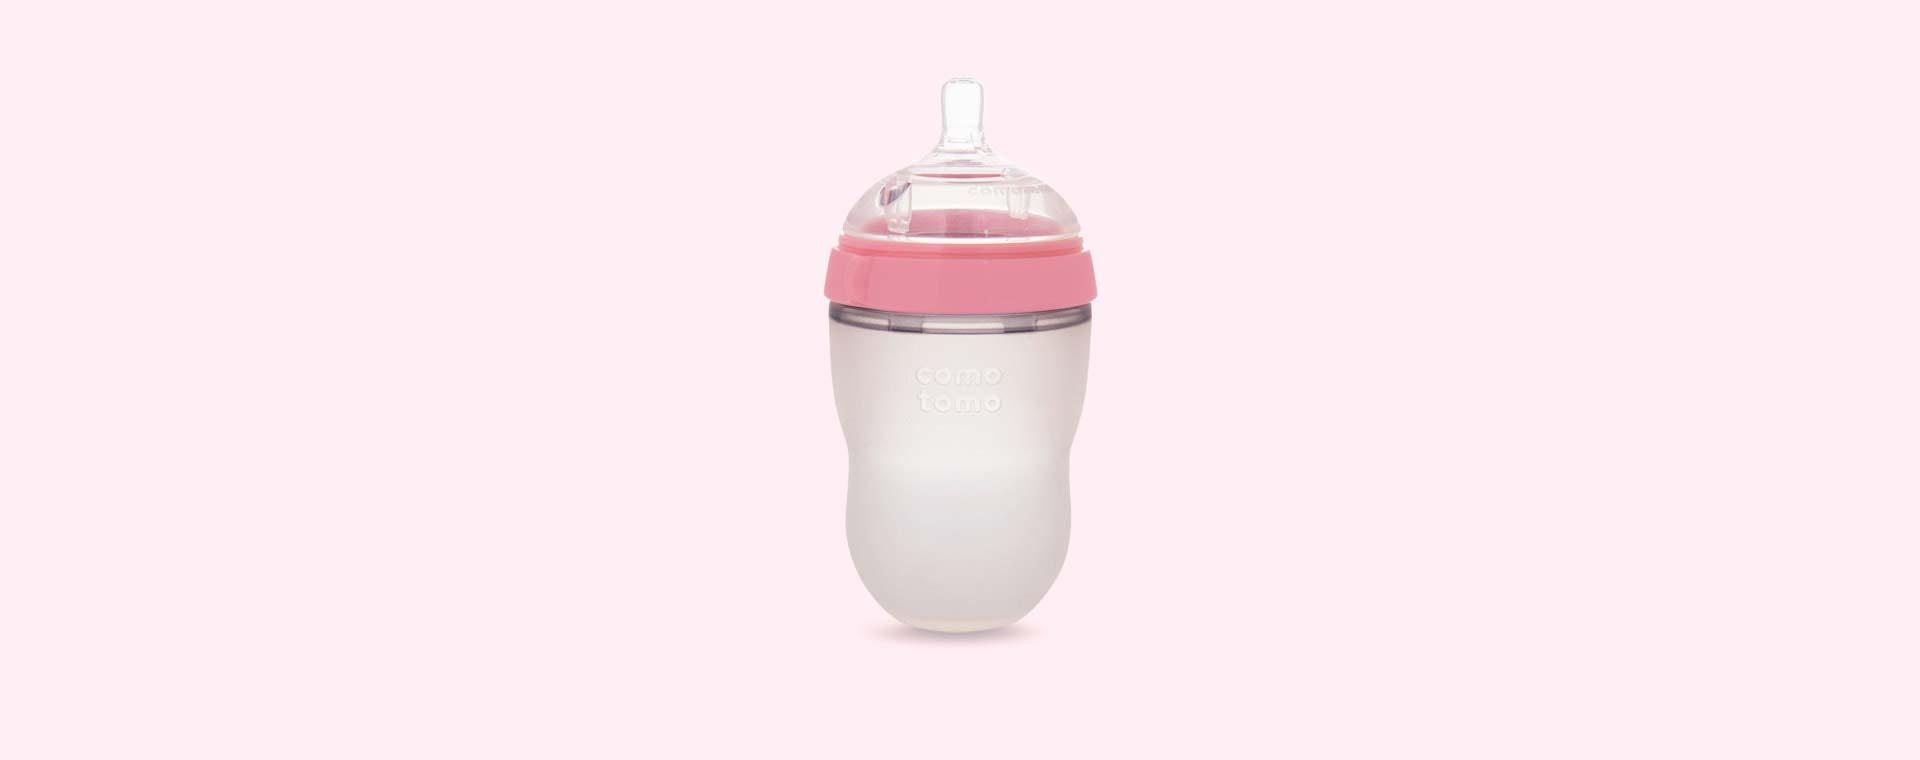 Pink Comotomo 8oz Single Bottle